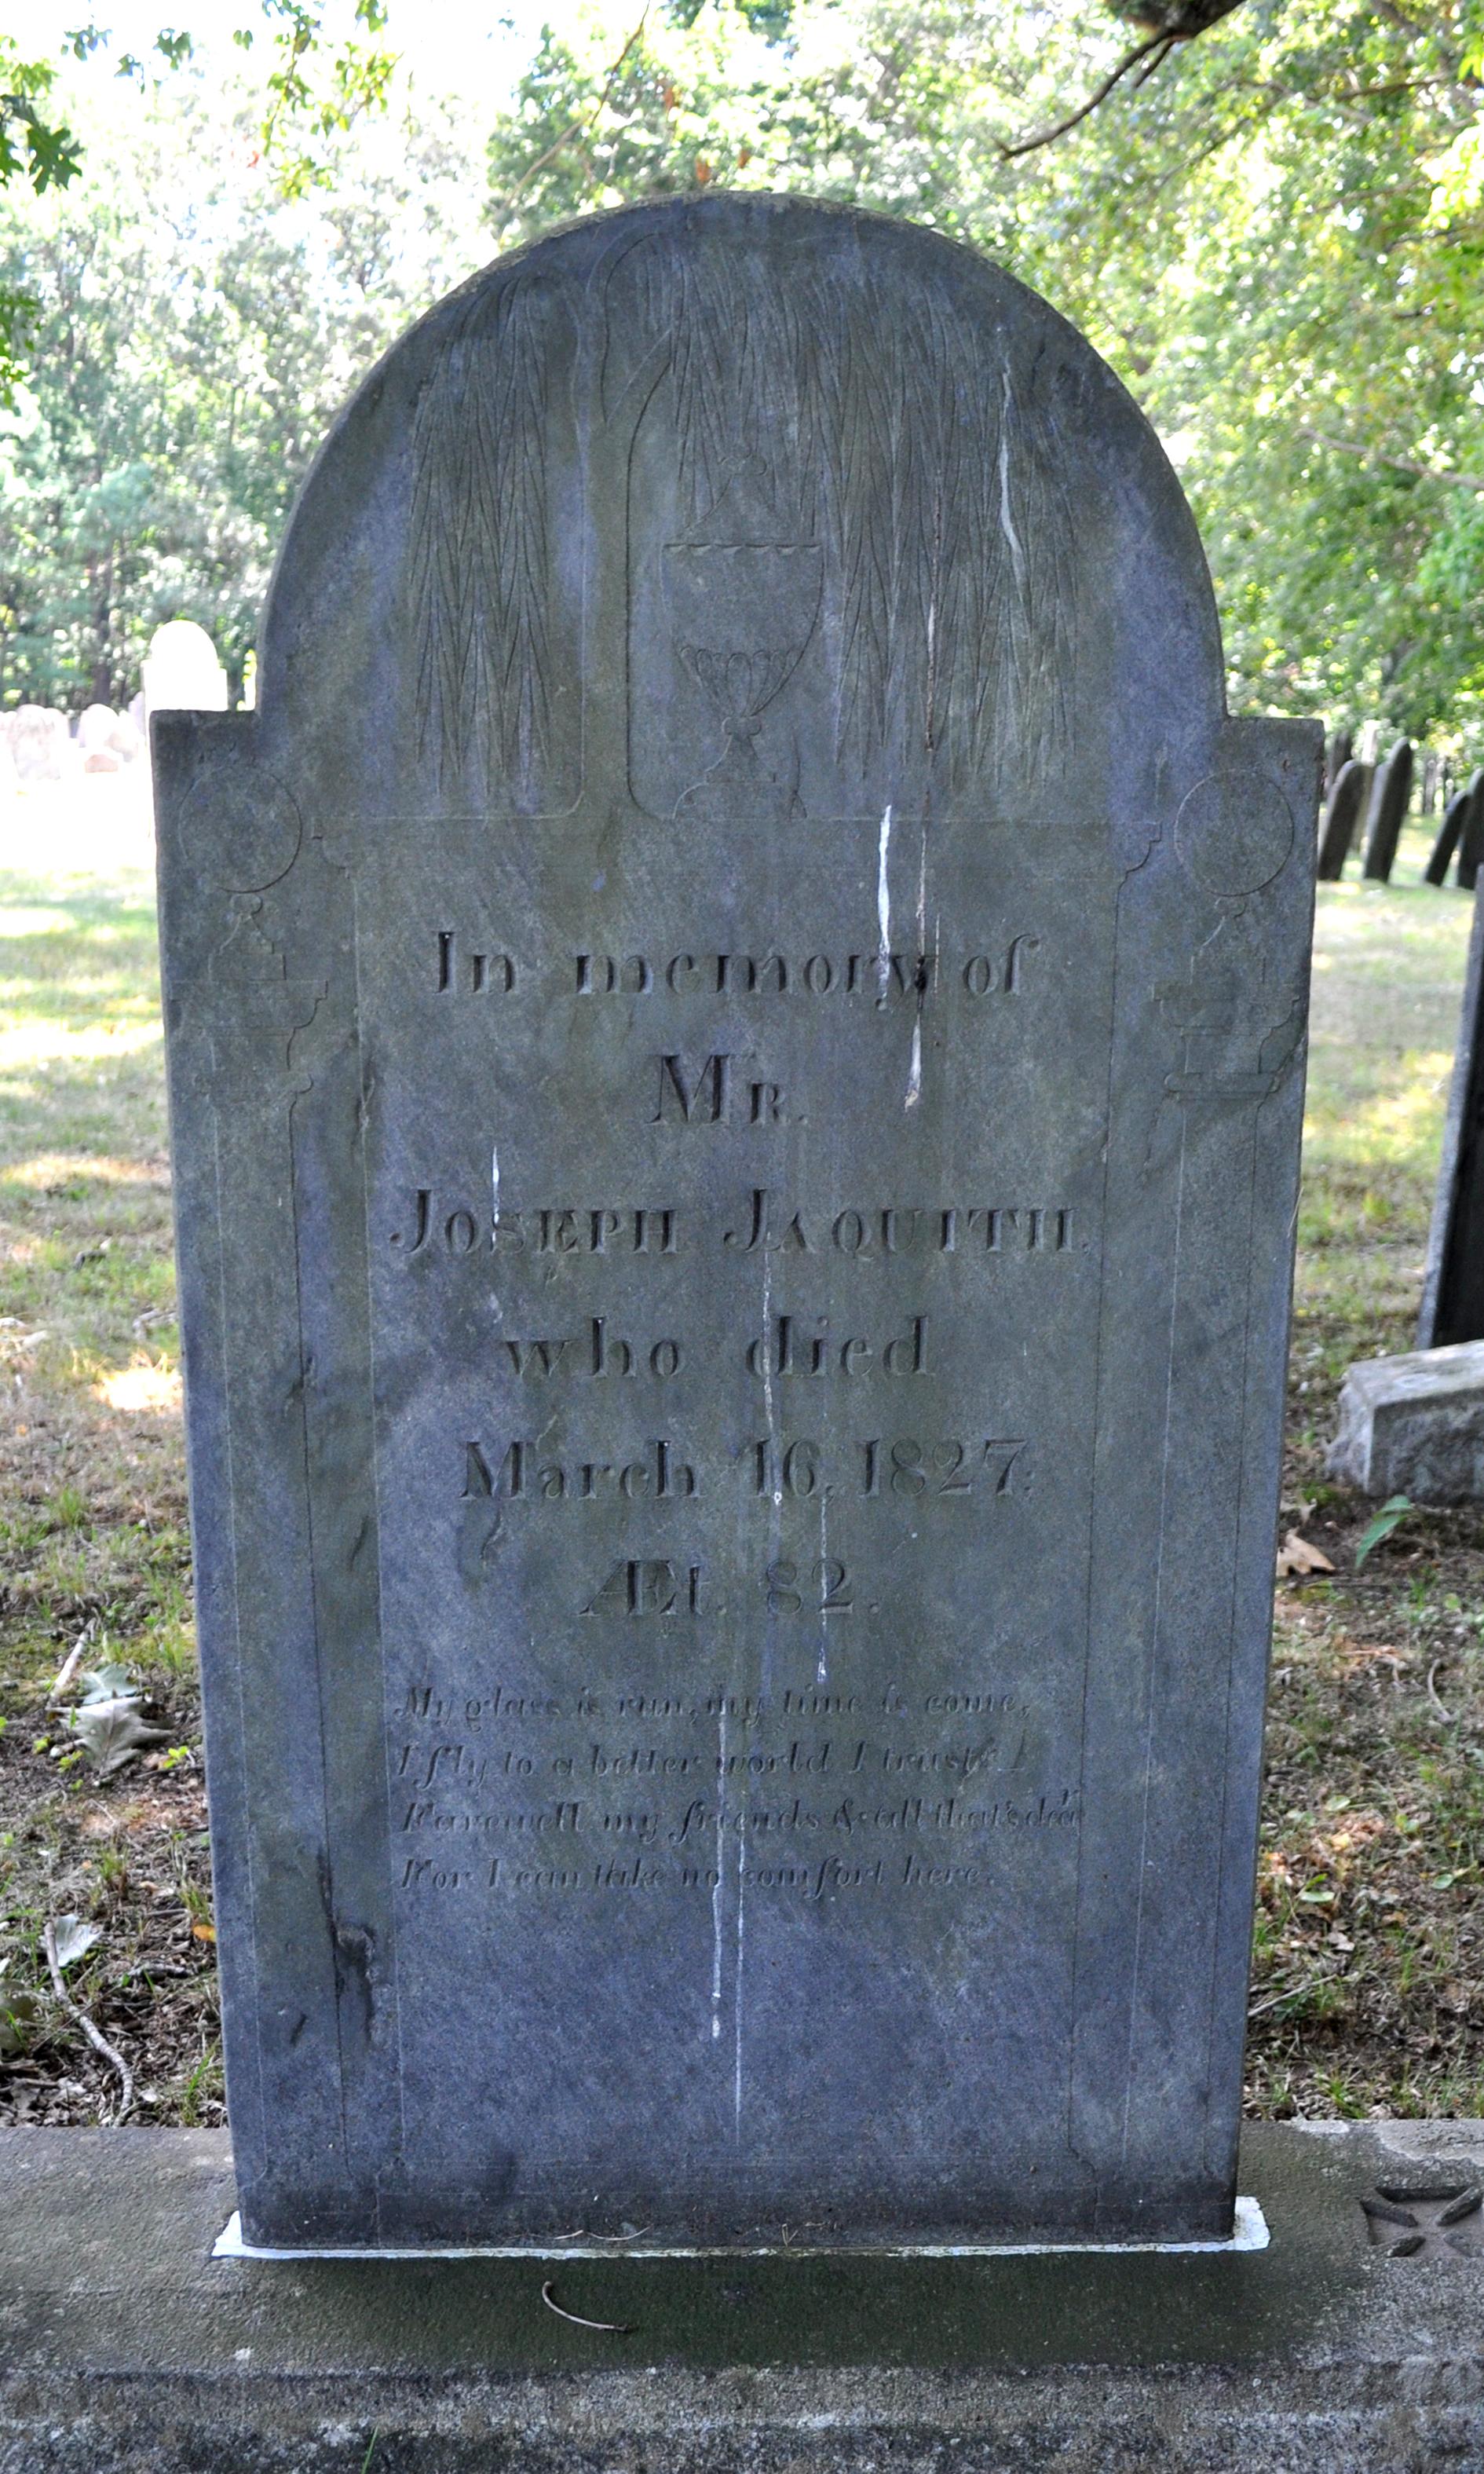 Joseph Jaquith